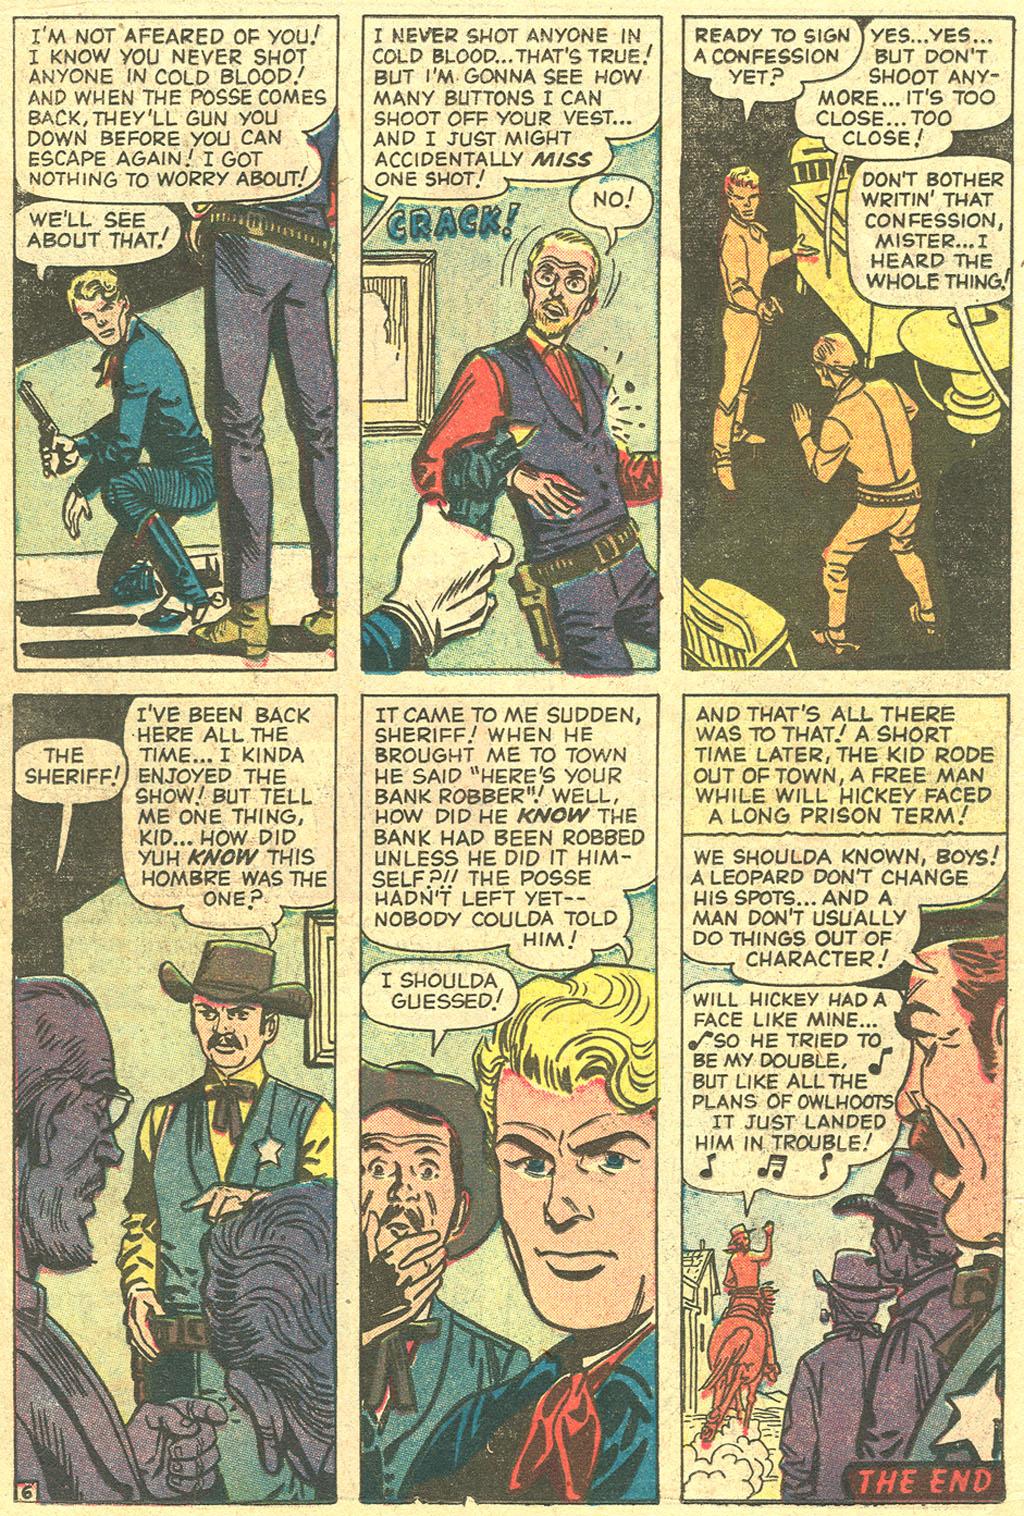 Read online Two-Gun Kid comic -  Issue #44 - 18